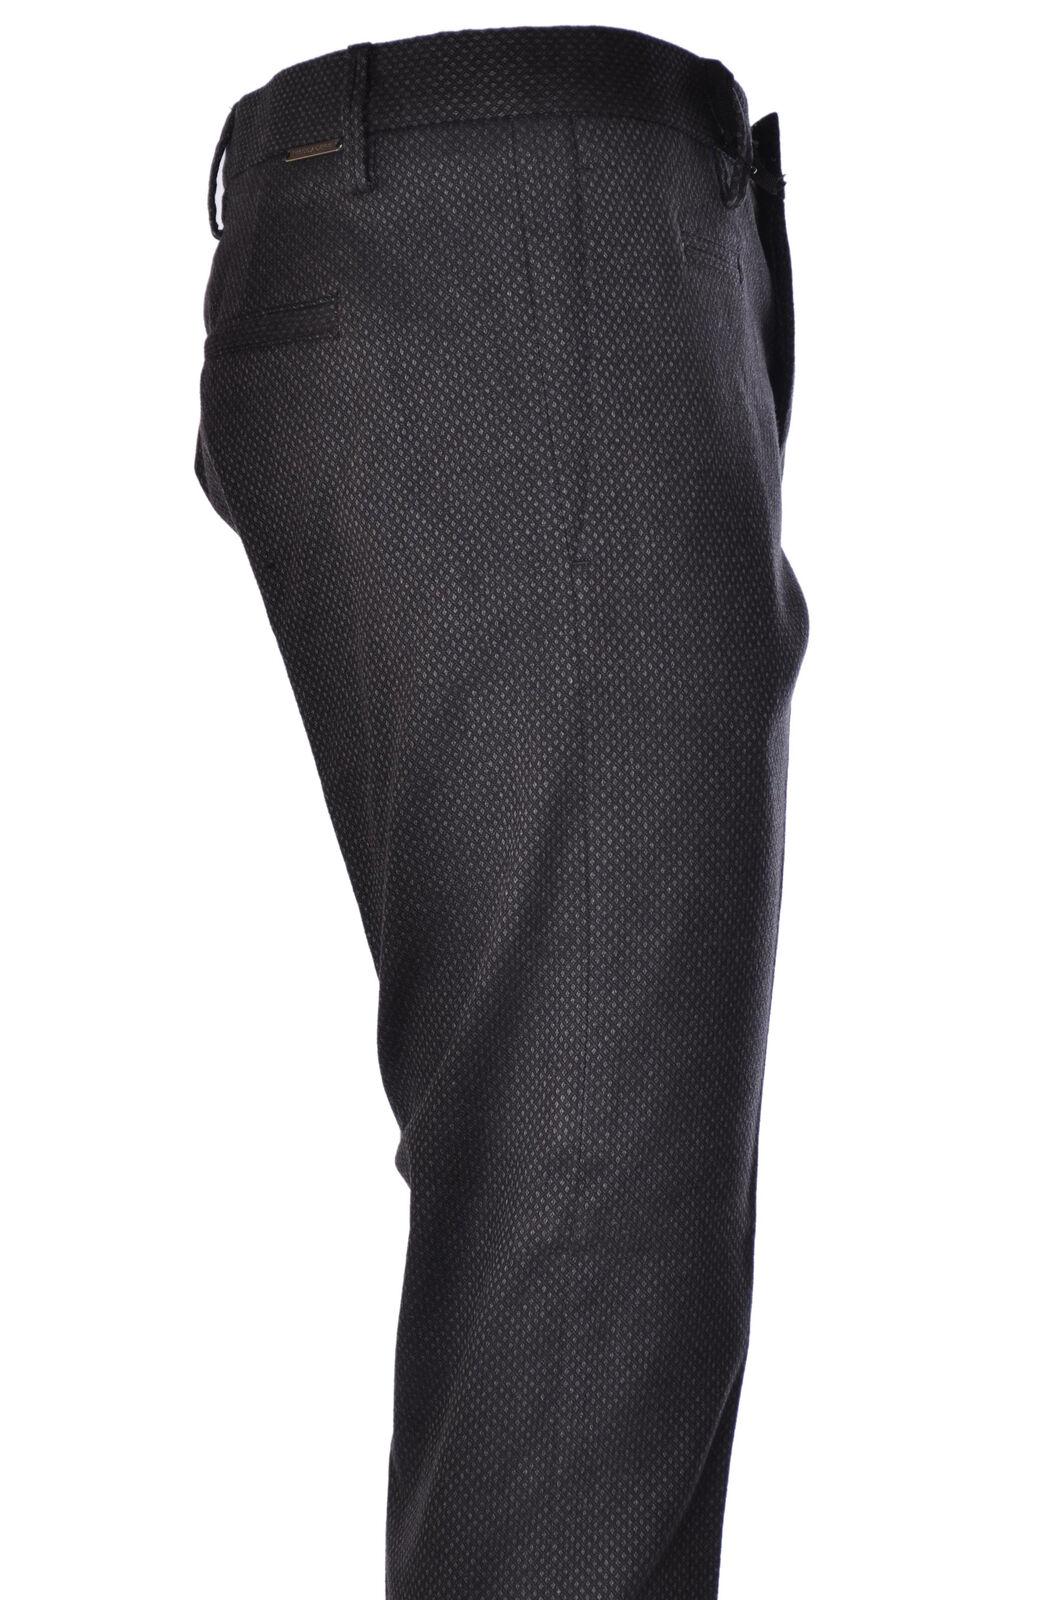 Messagerie - Pantaloni-Pantaloni - men - grey - 937002C185305